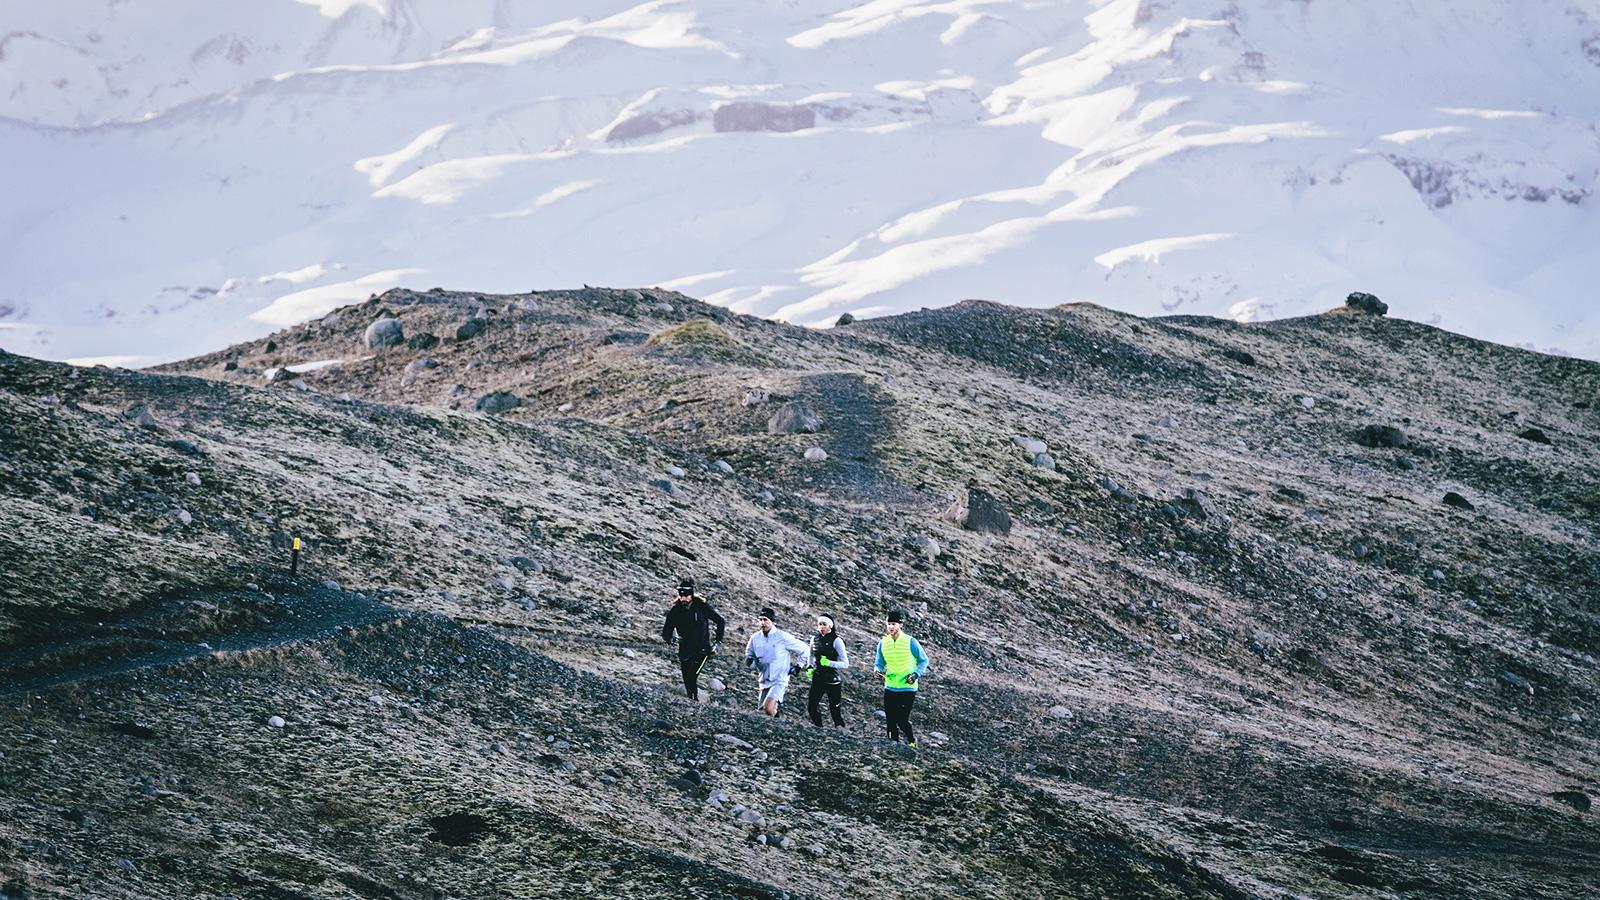 Runviking Large Mountainruns